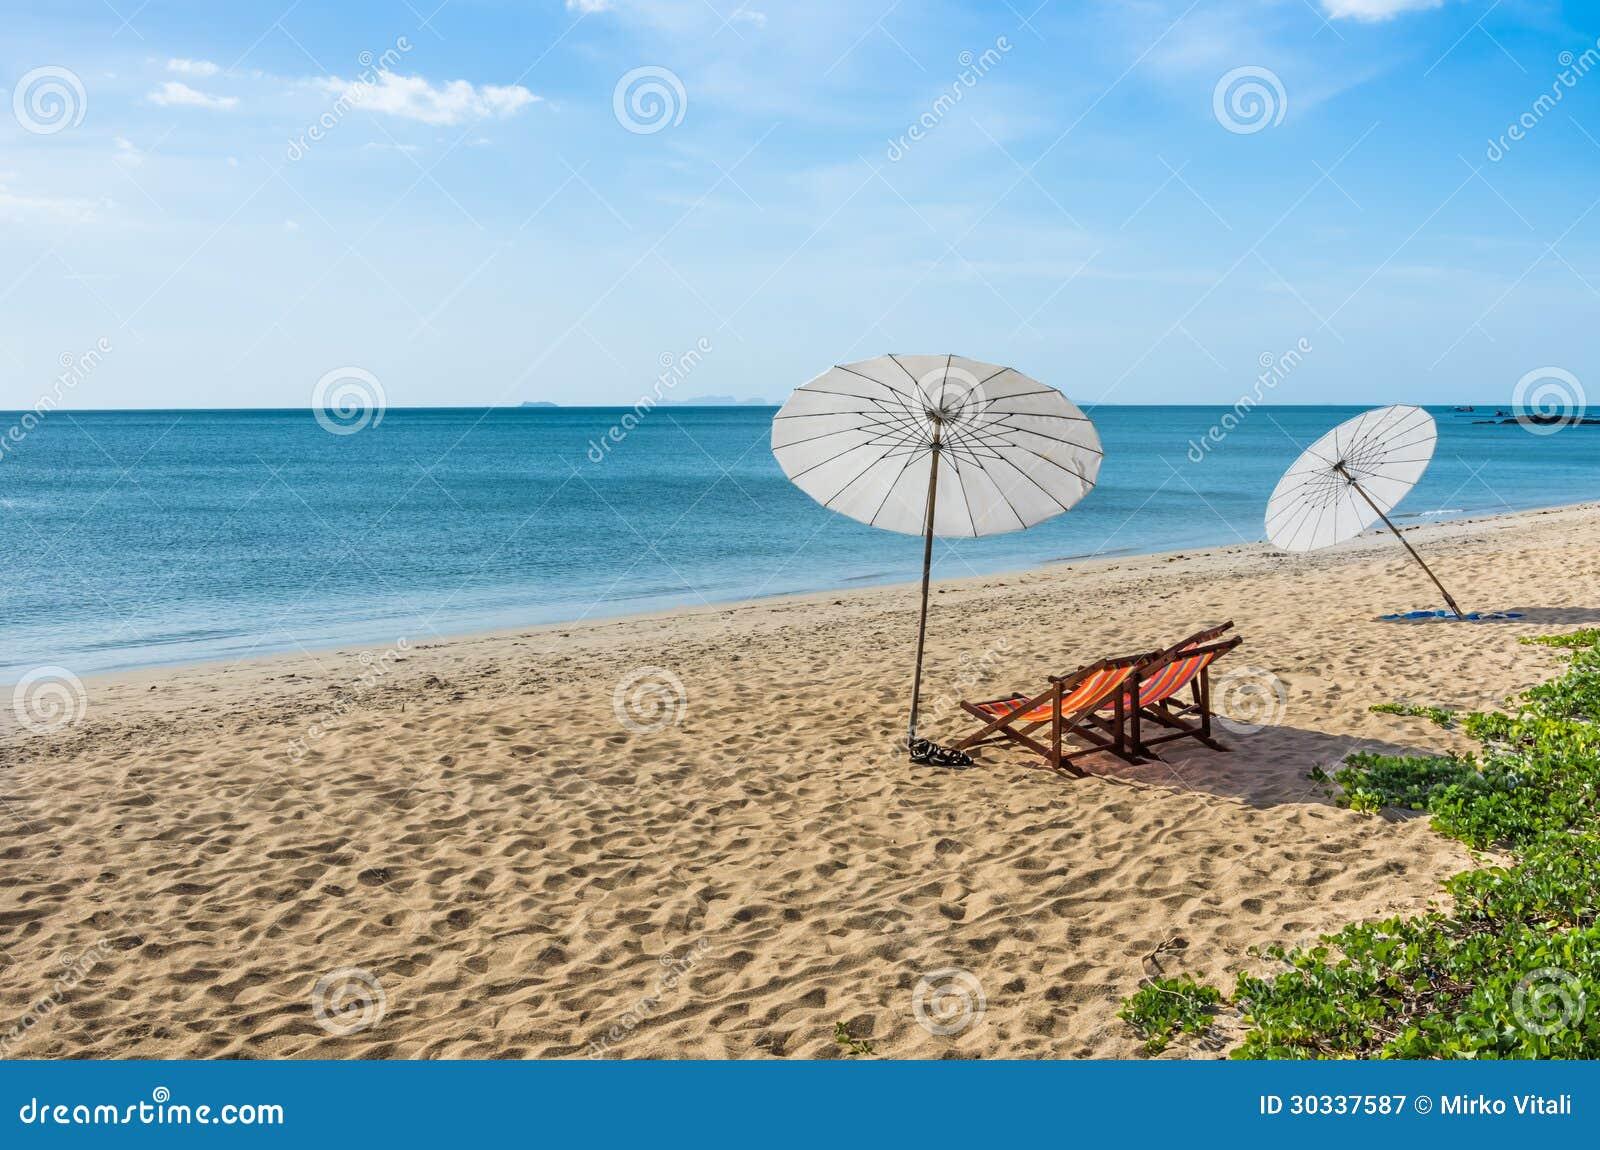 enslig i strand